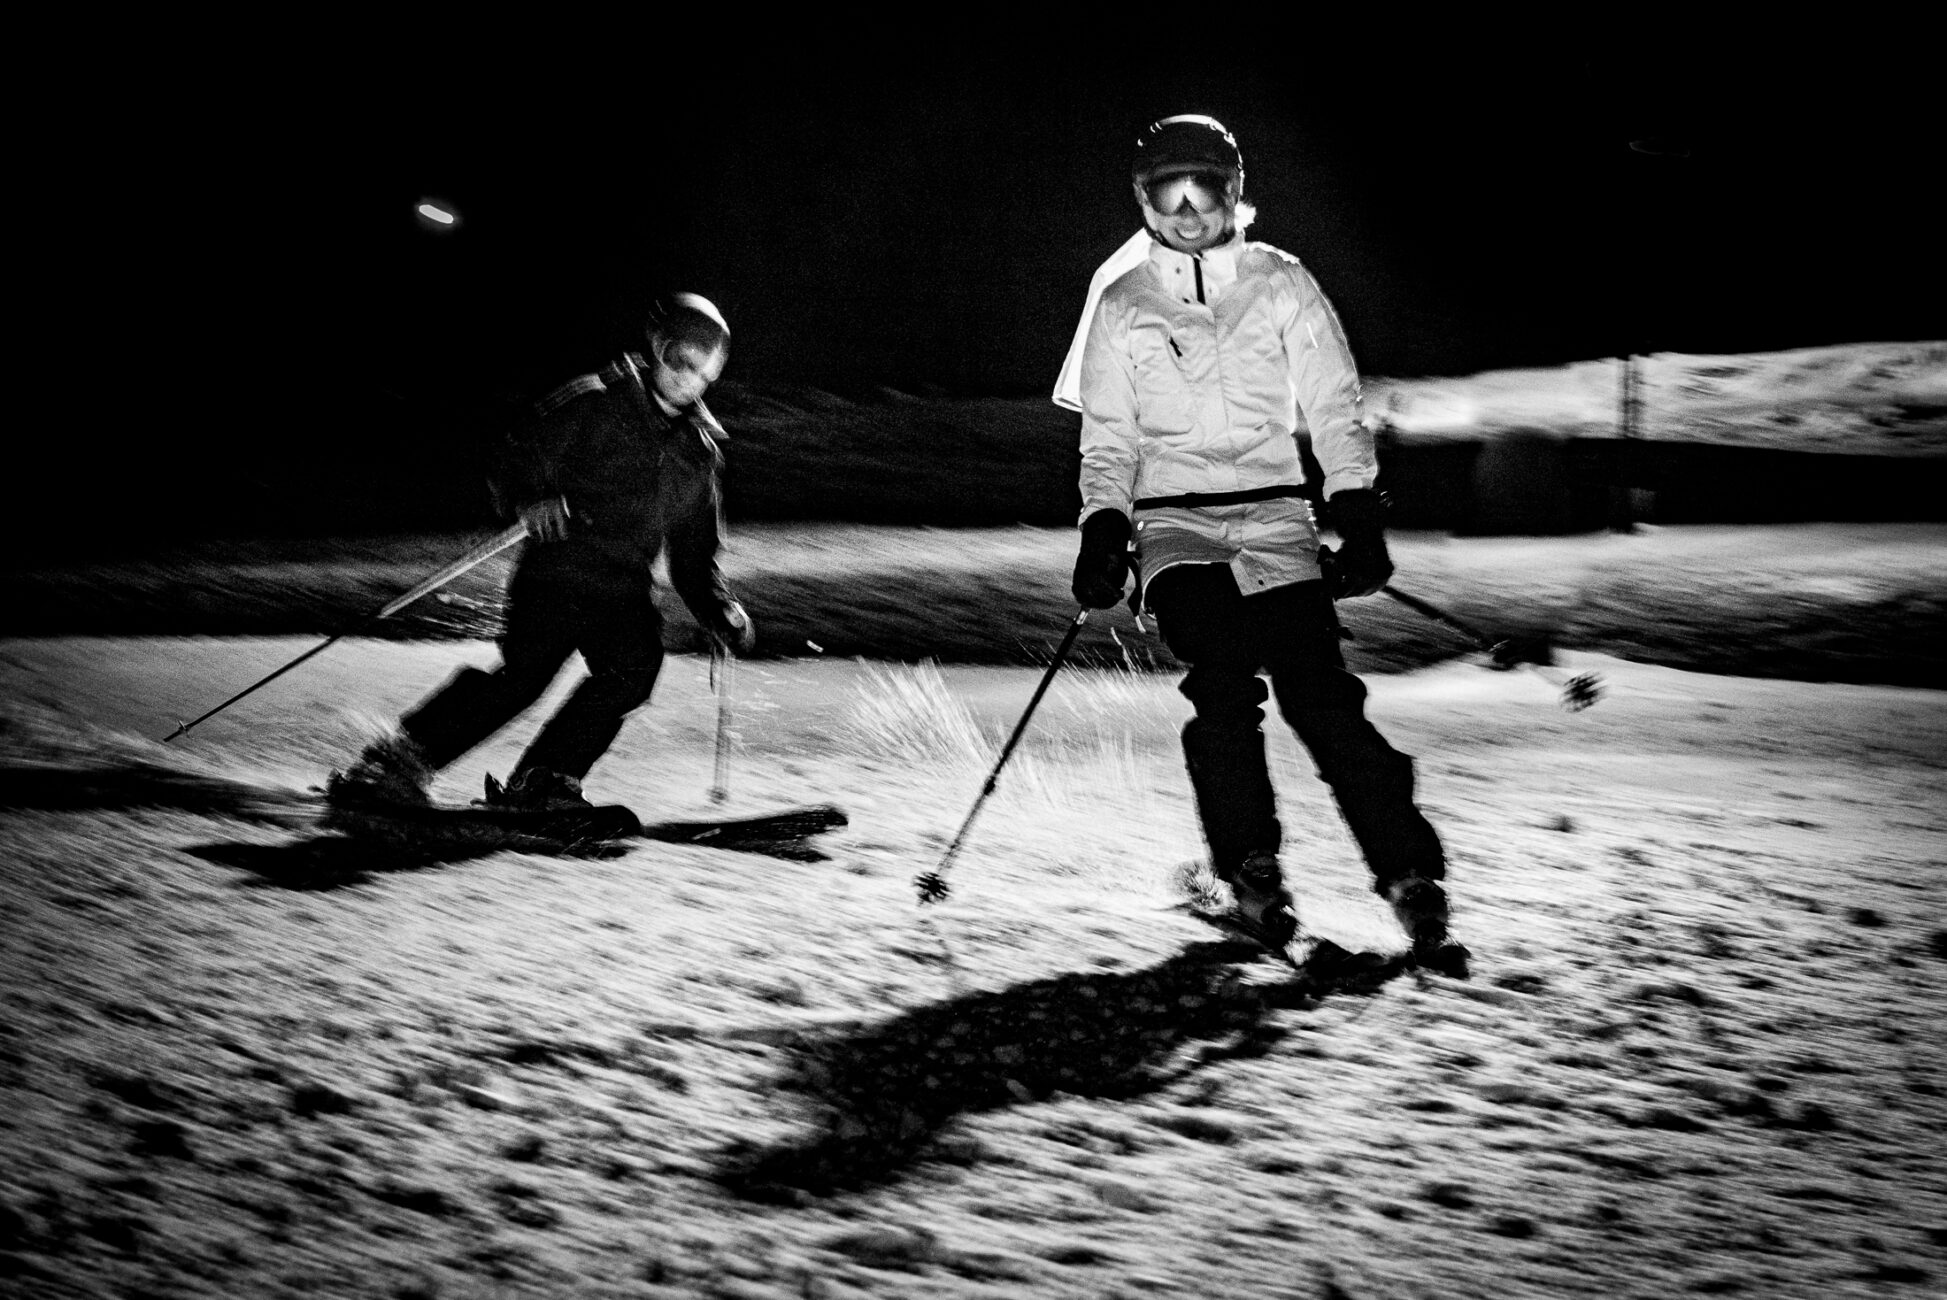 Bride and groom ski at night